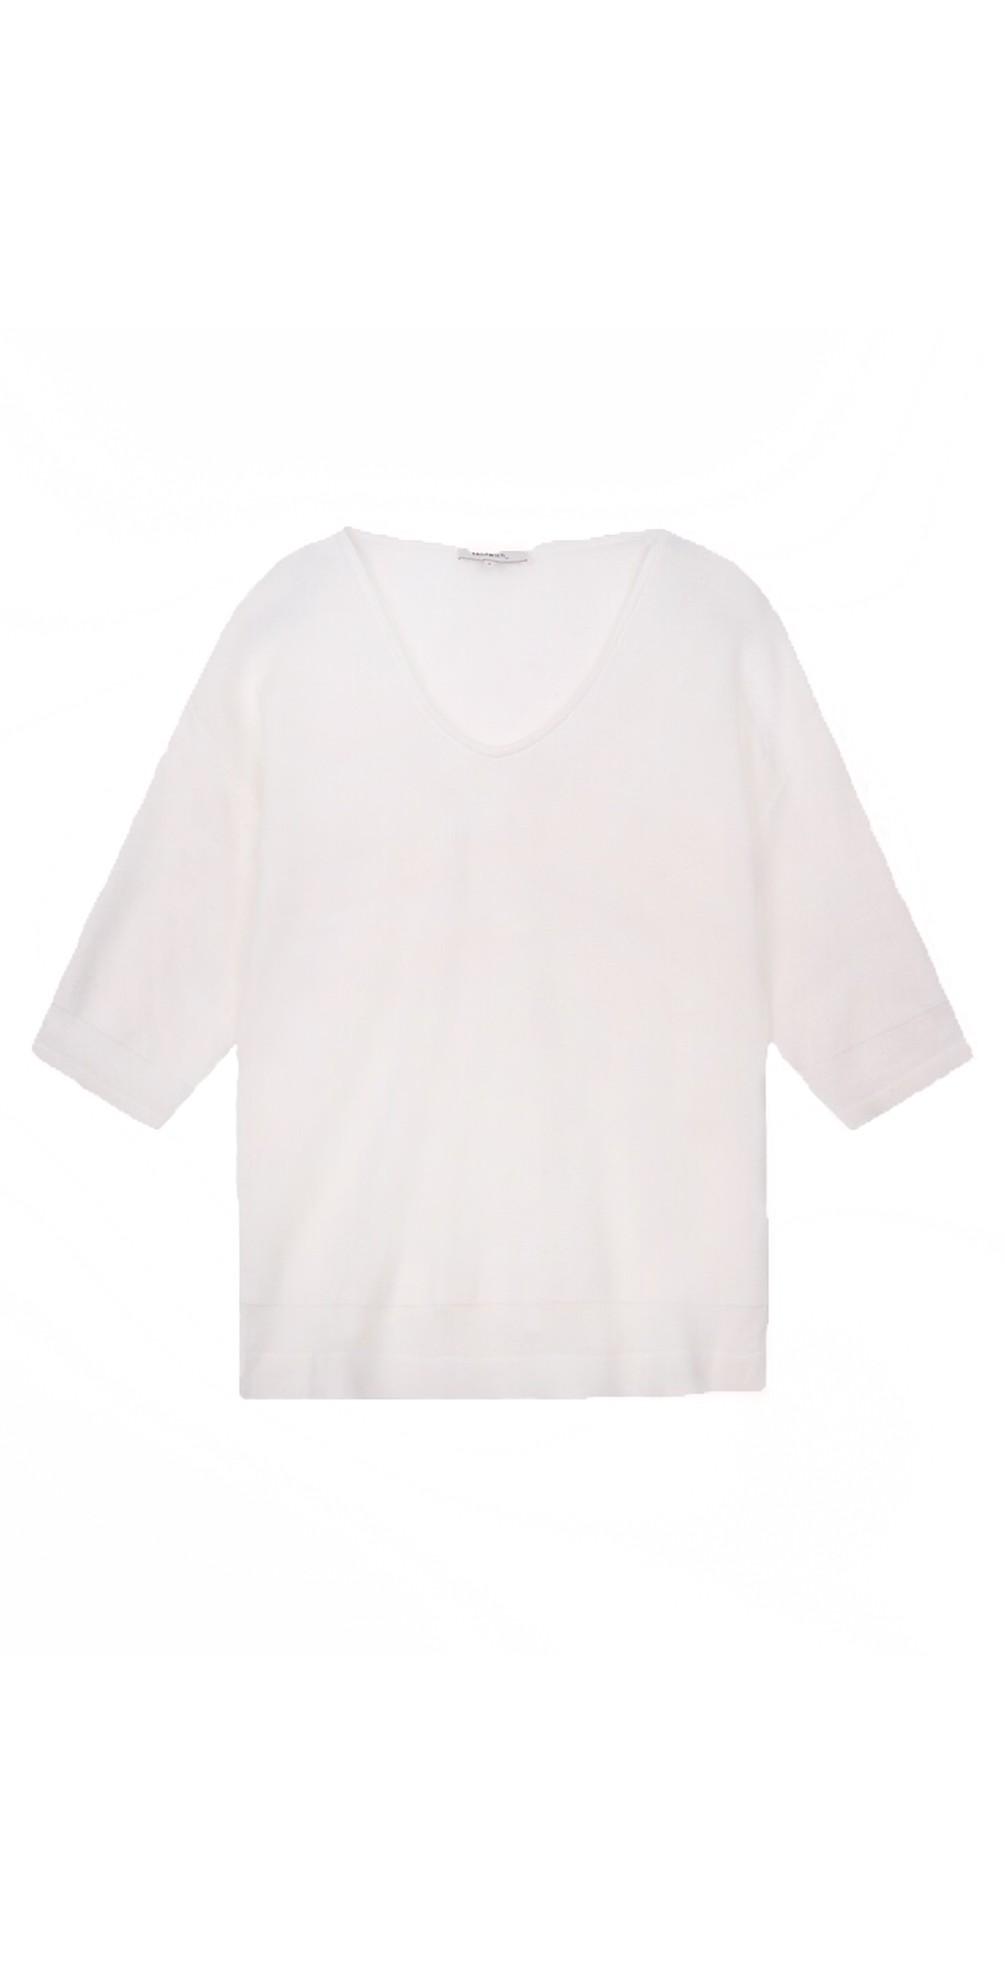 Pullover Long Sleeves  main image